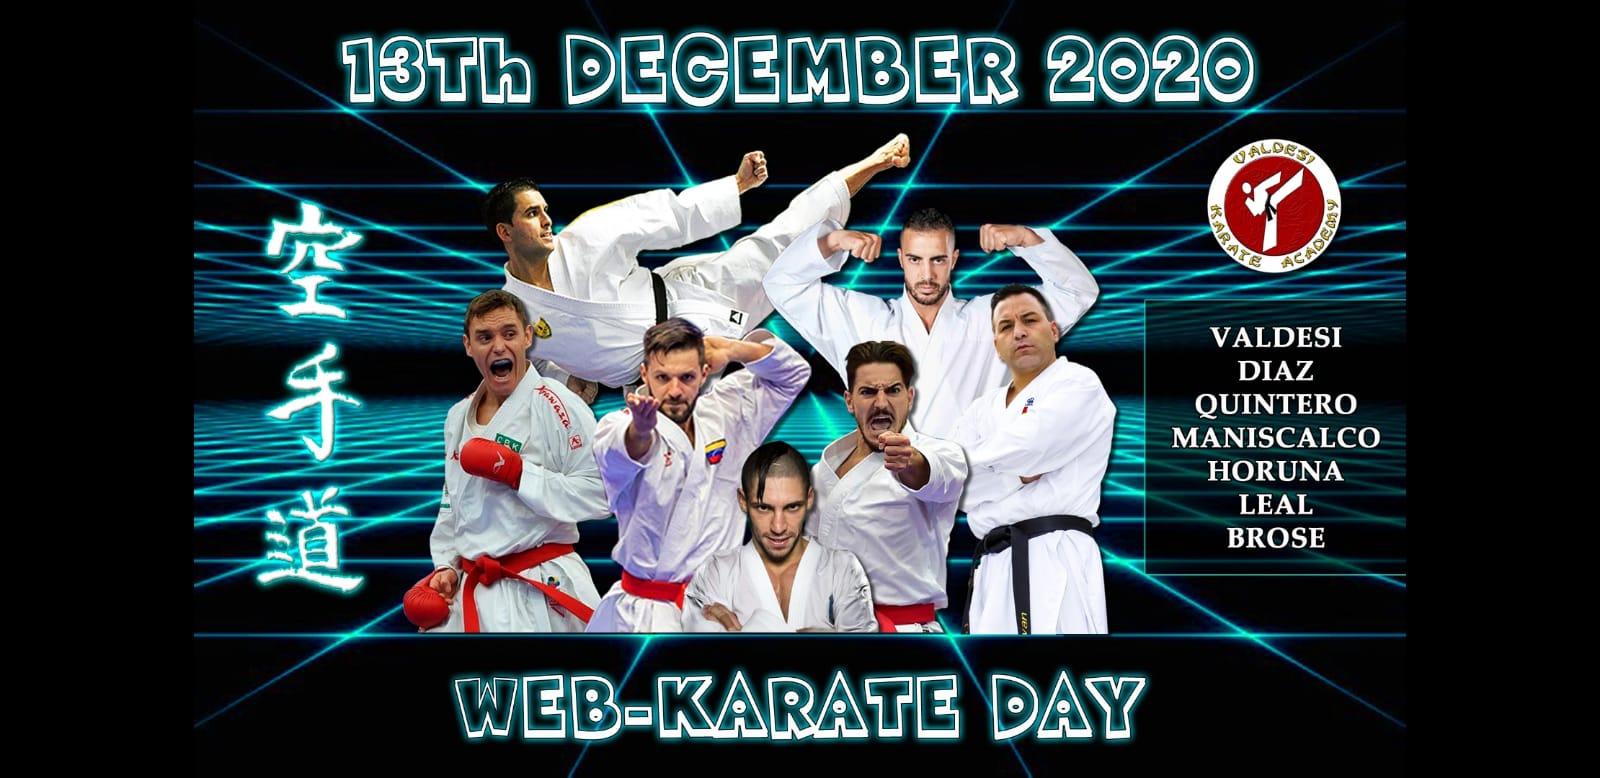 Web Karate Day - Session Kumite - Brose